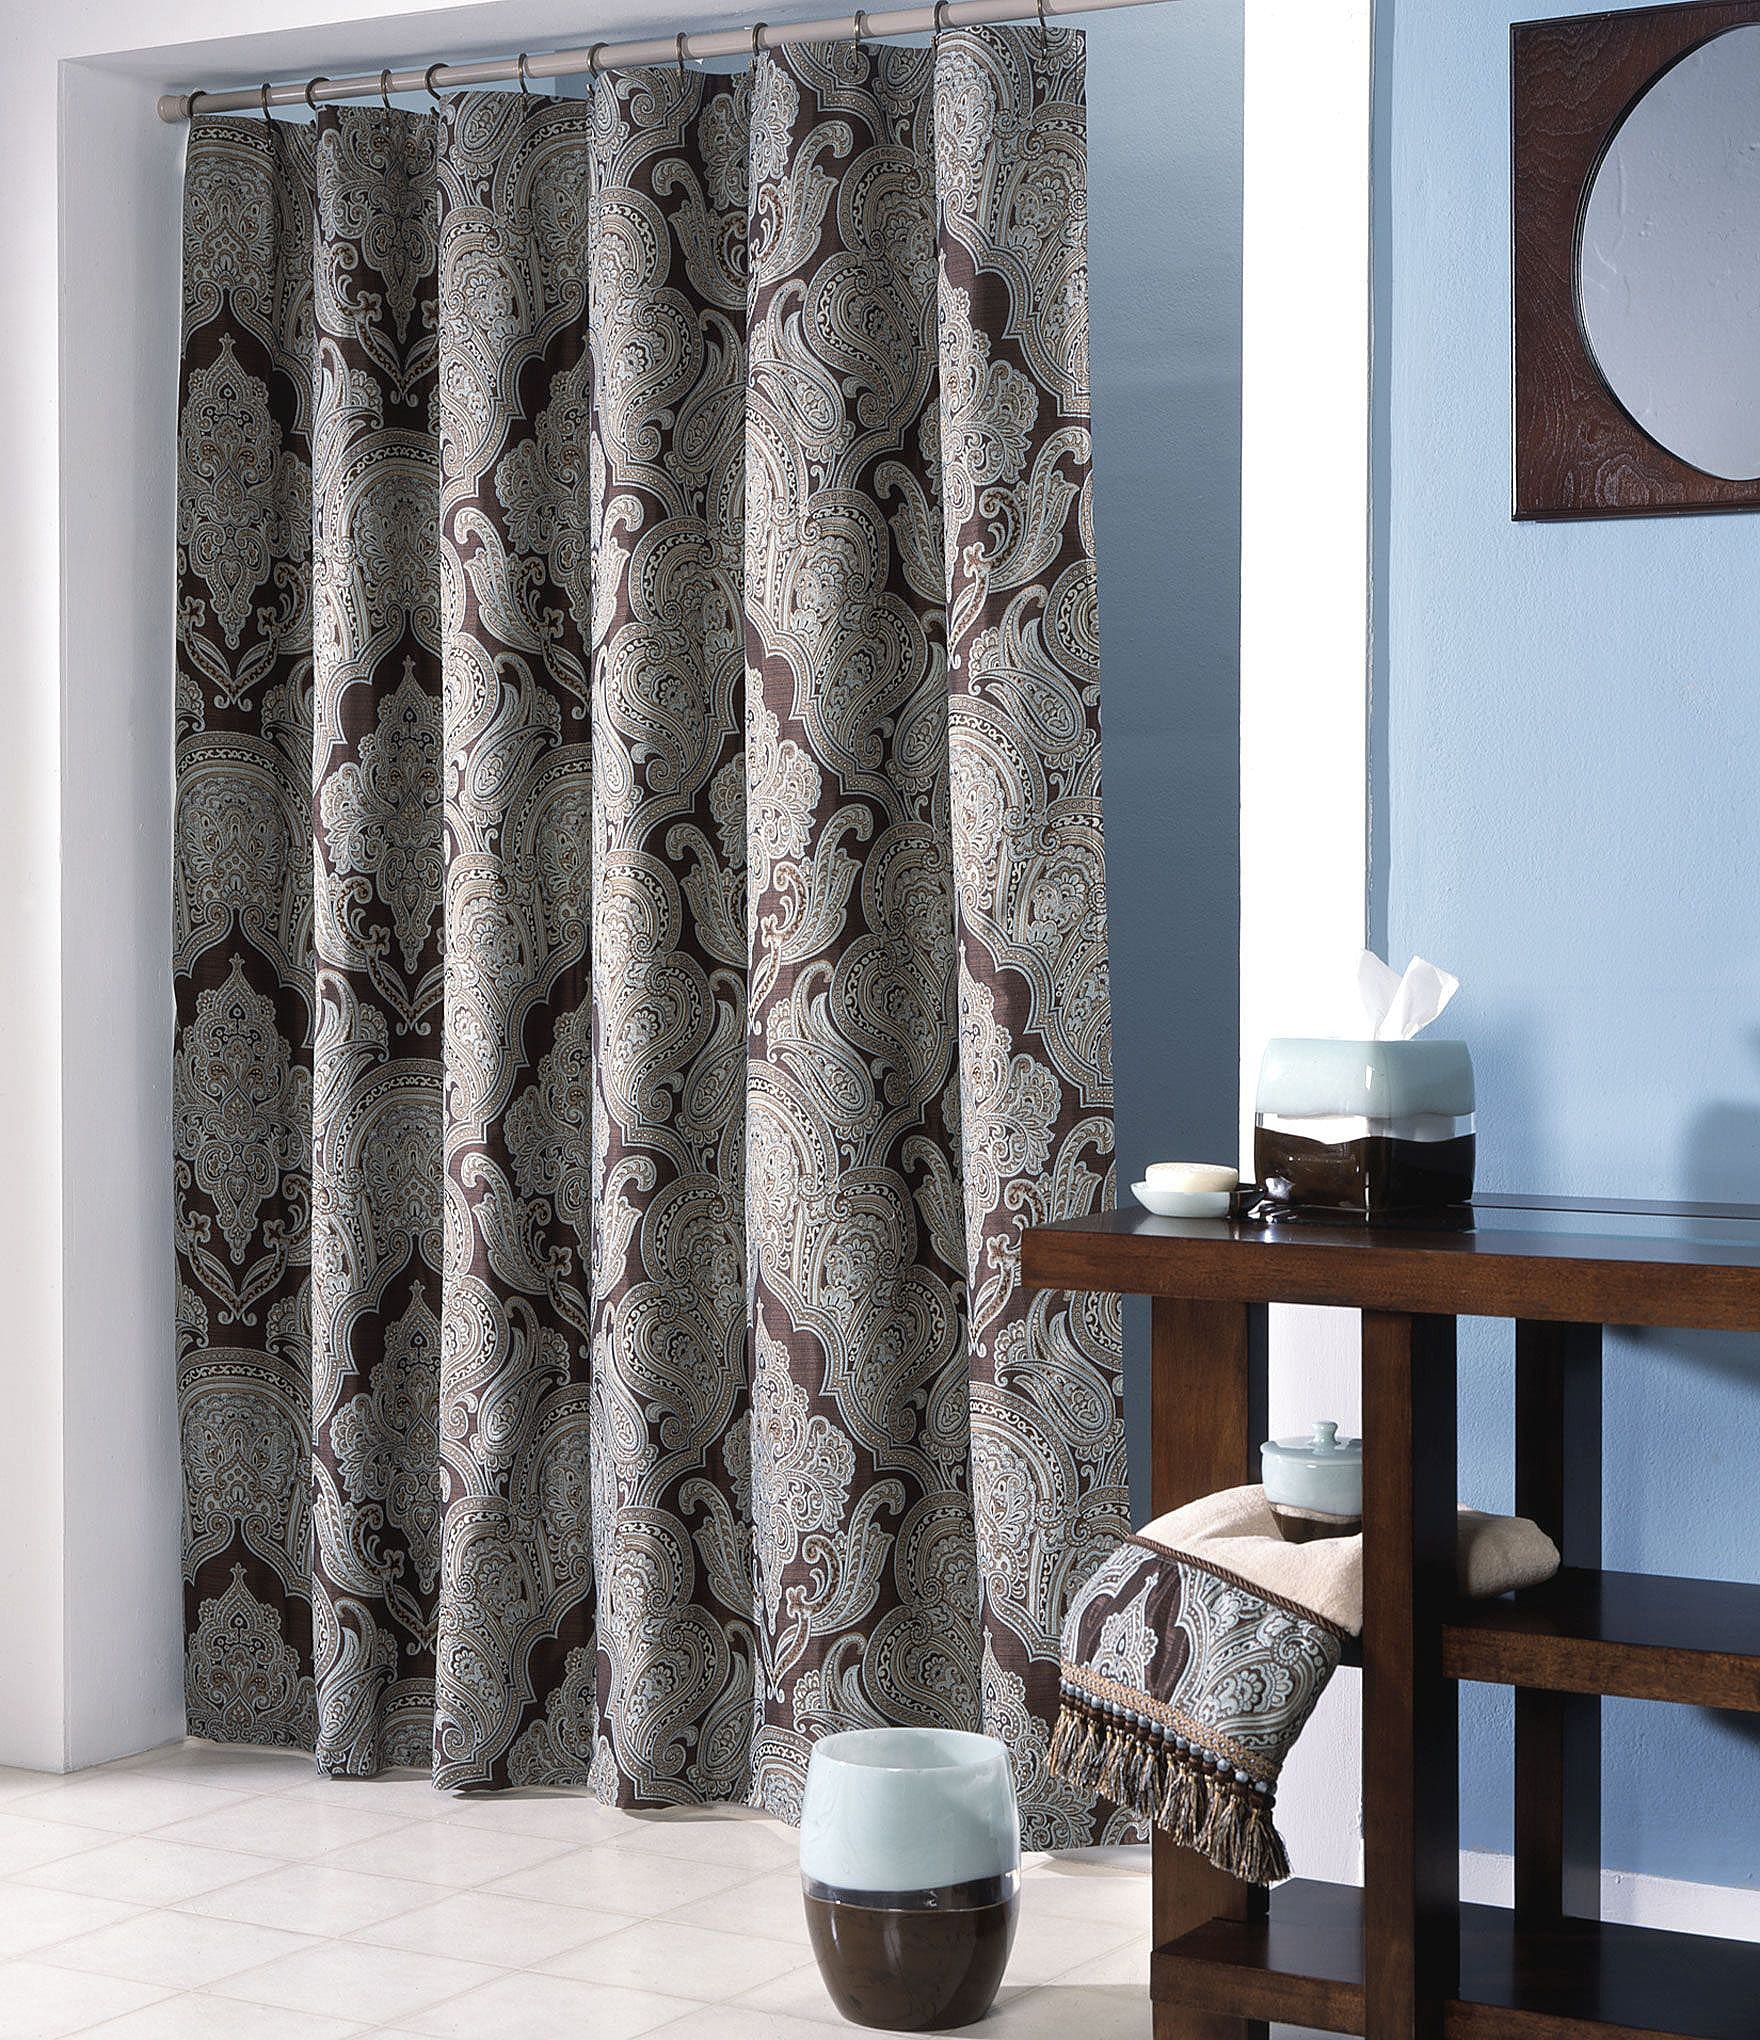 Home | Bath & Personal Care | Shower Curtains & Rings | Dillards.com